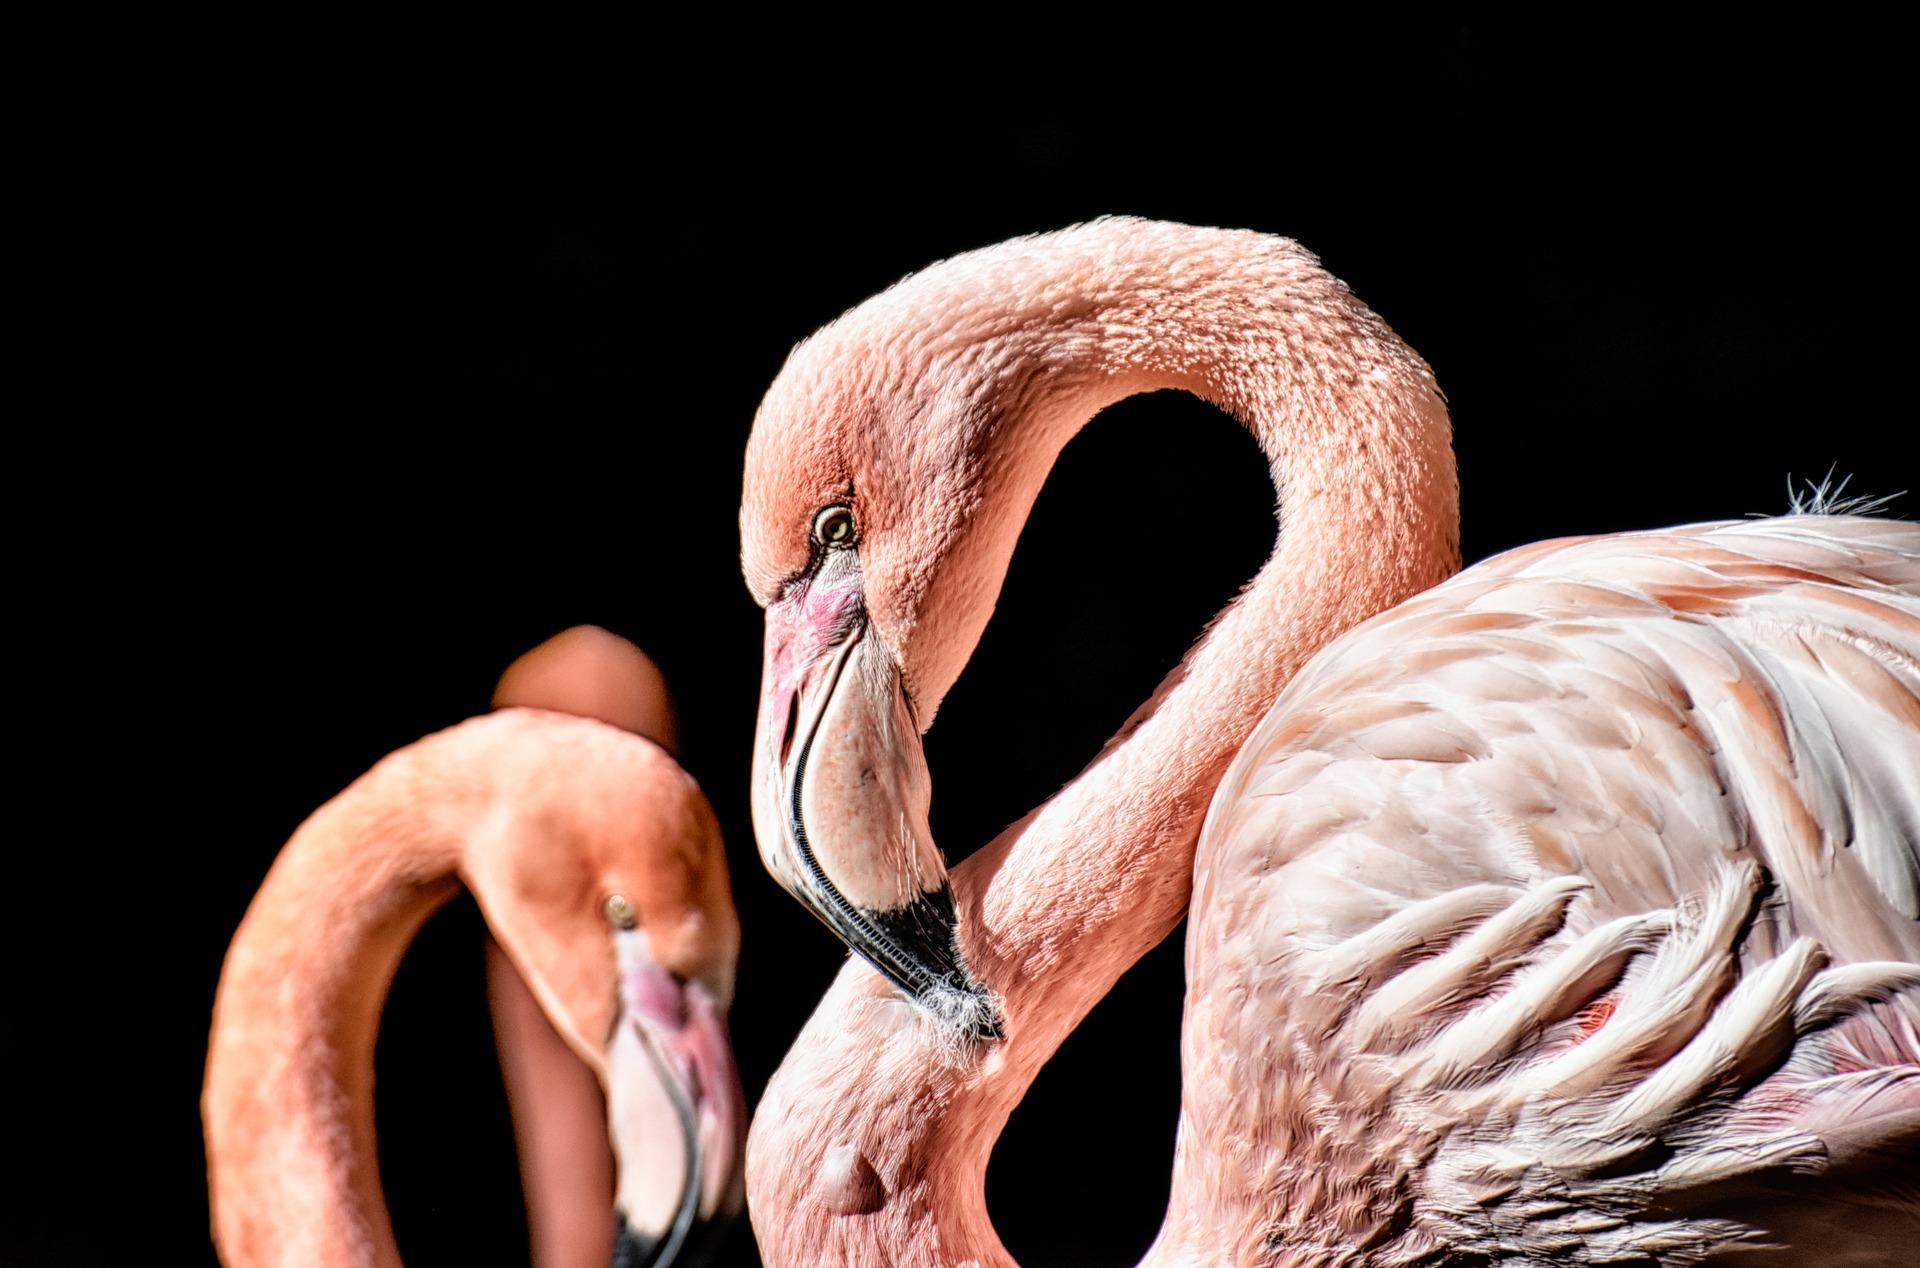 flamingo-3743094_1920.jpg